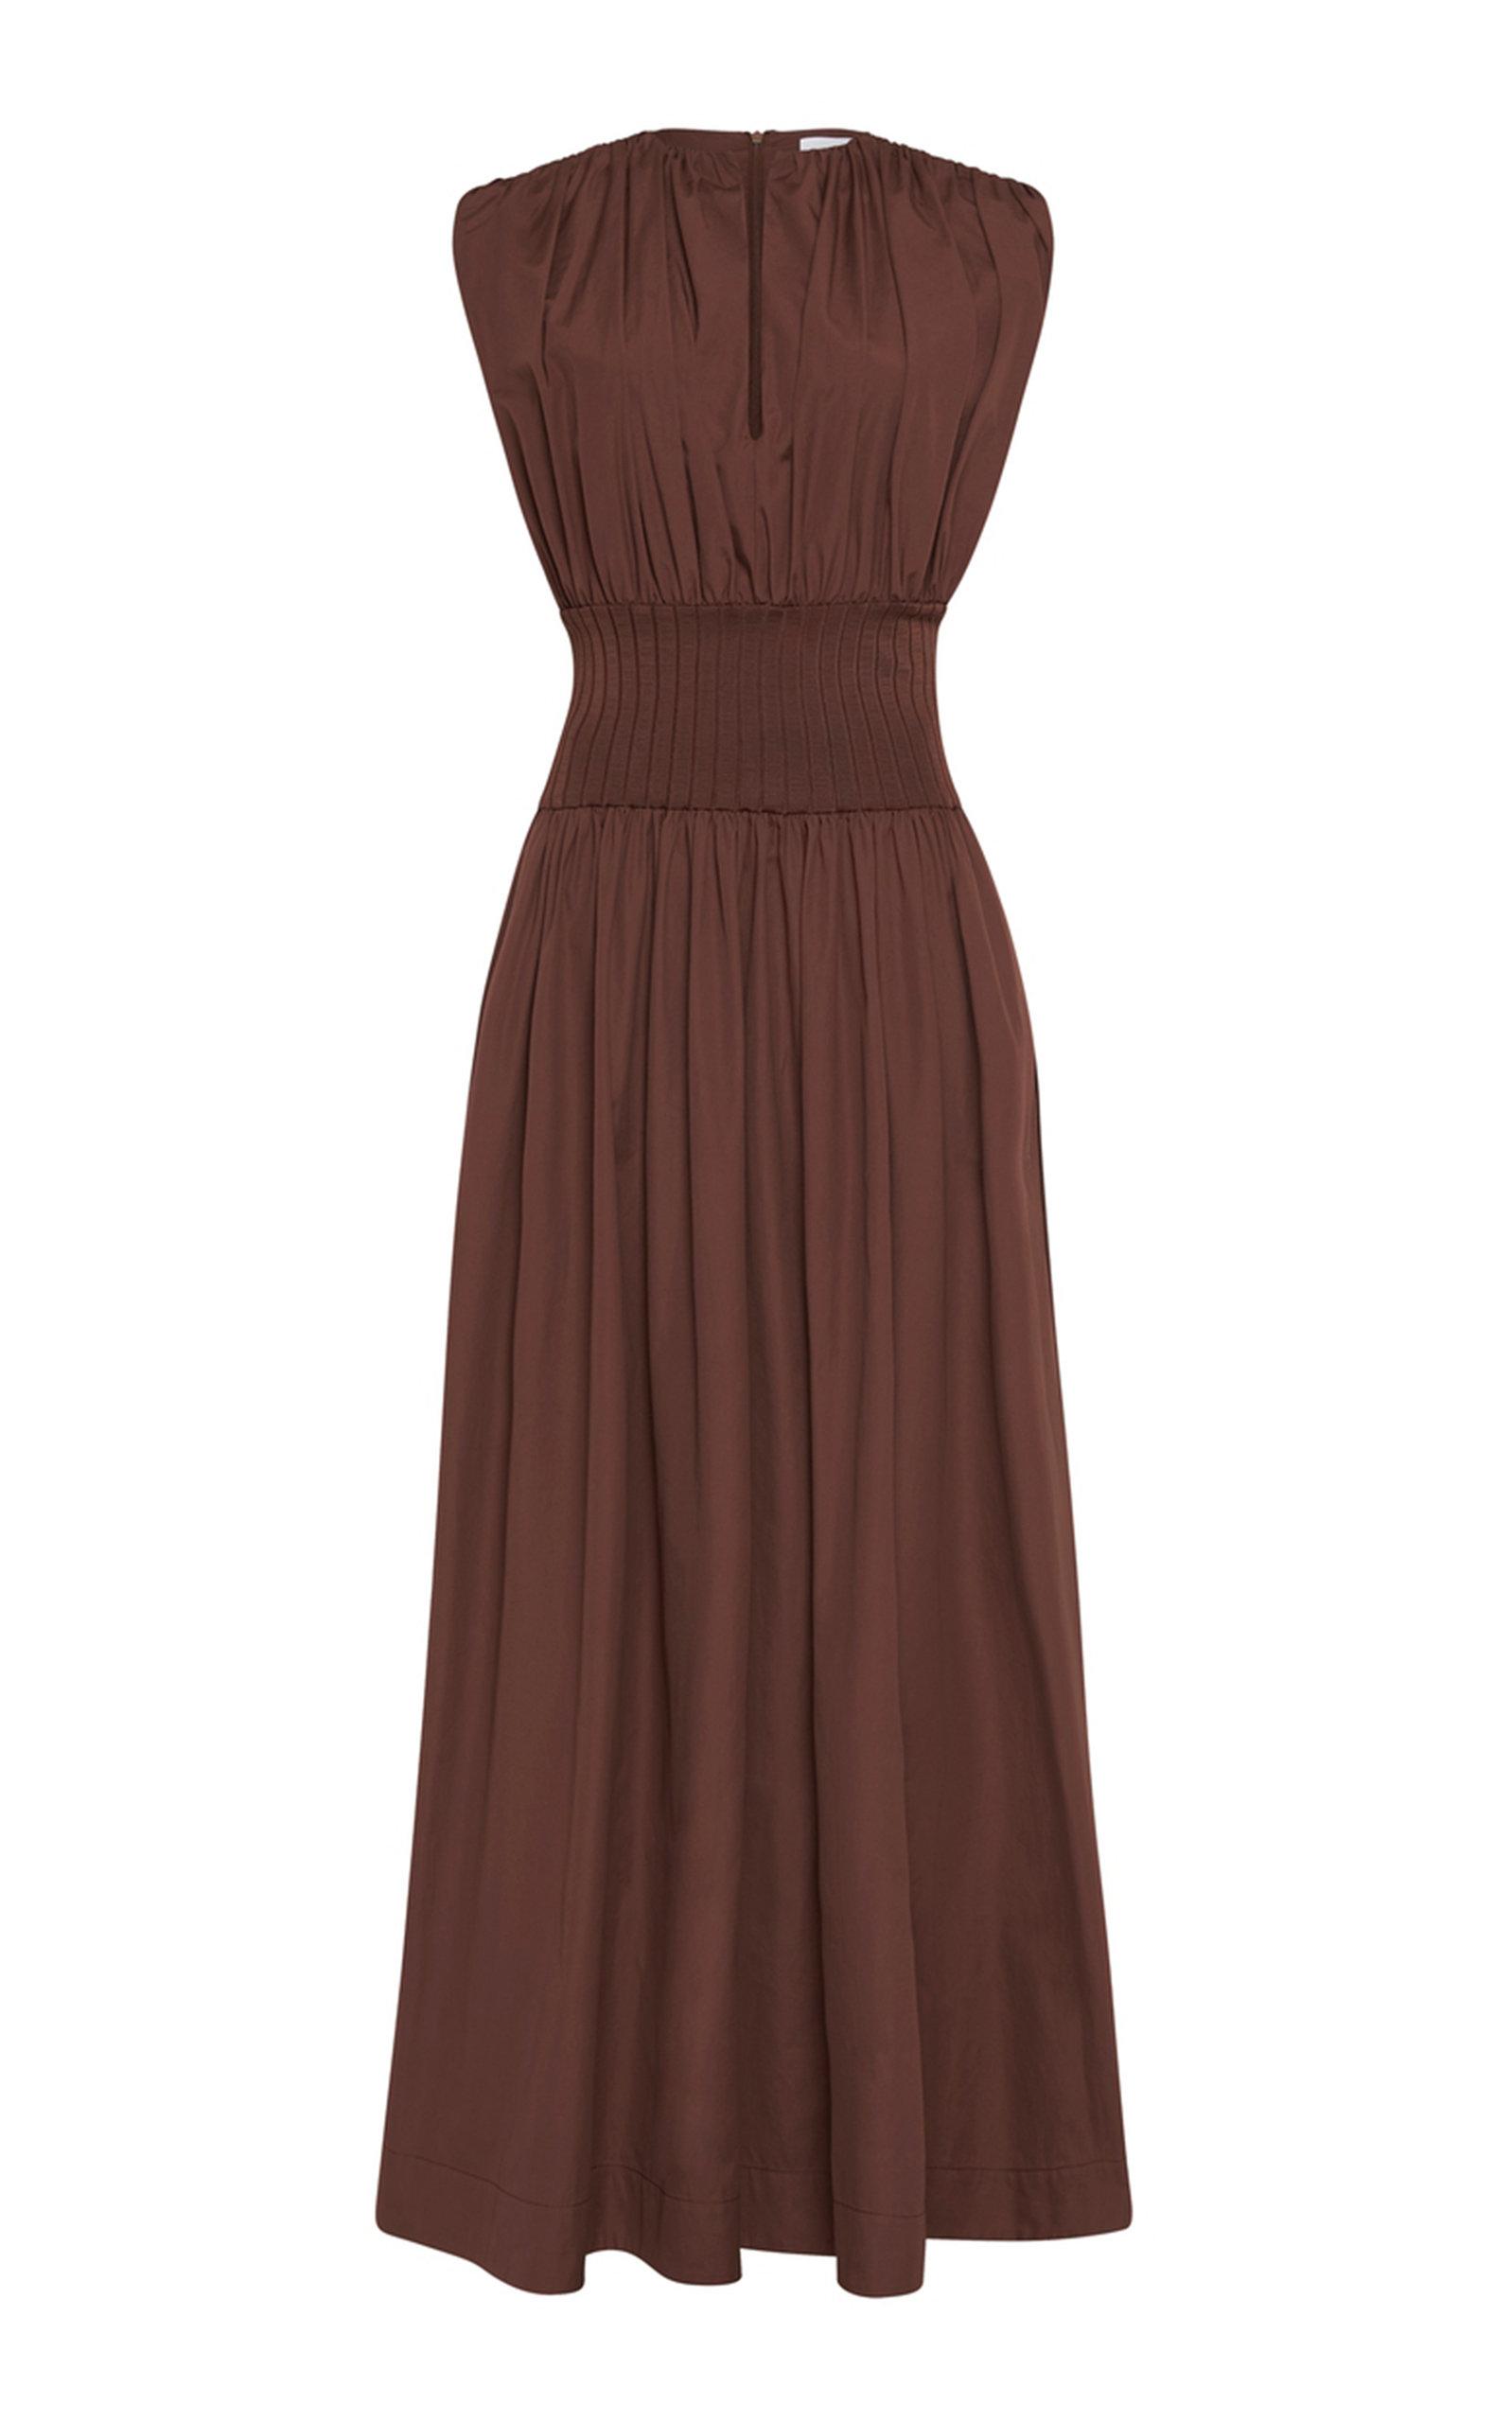 Women's Gathered Cotton Maxi Dress